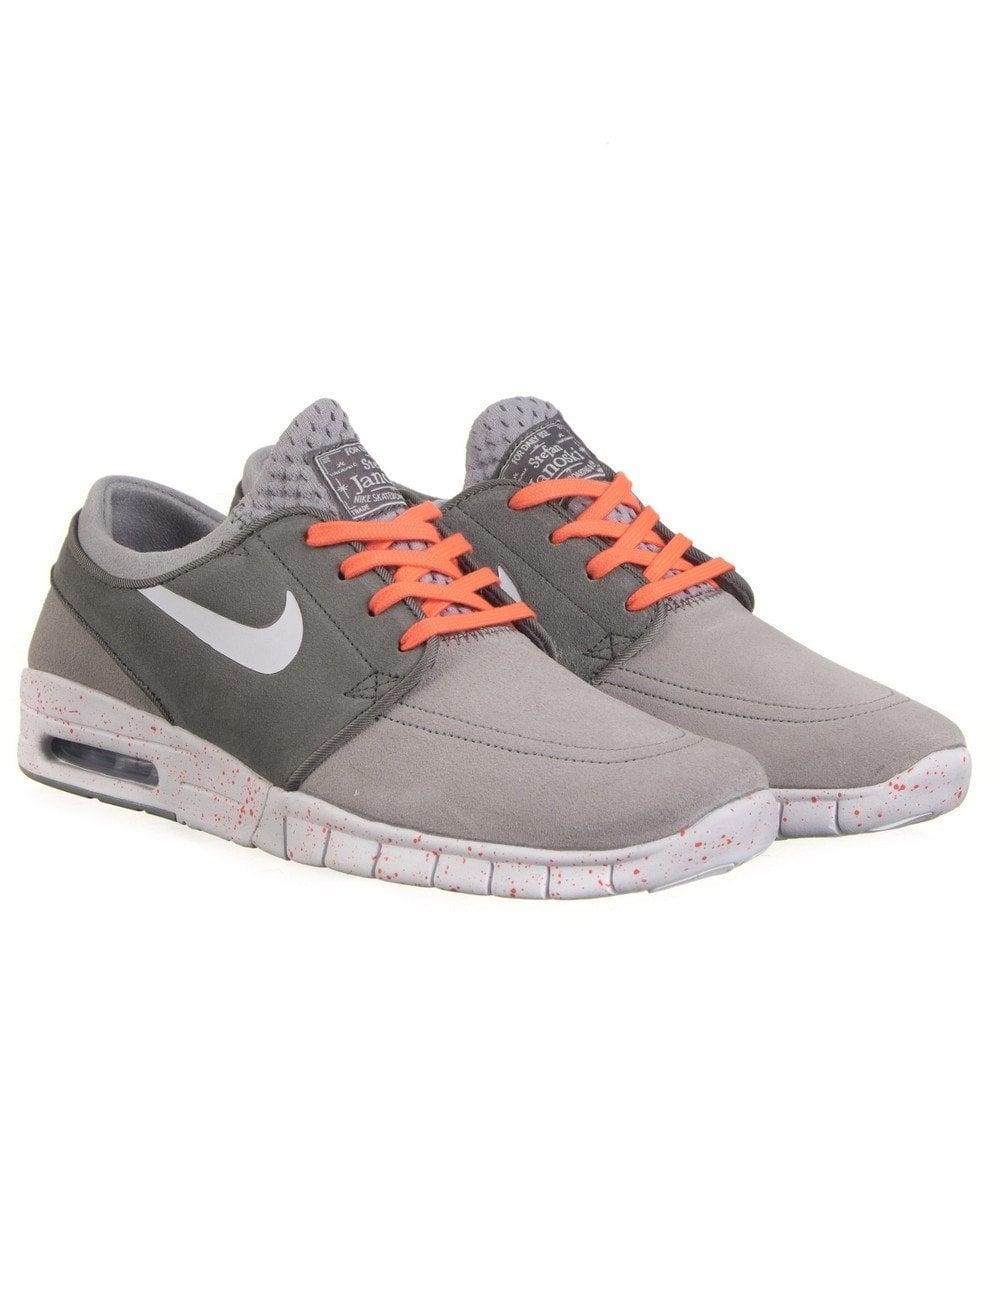 size 40 f9f3b 24e0a Nike SB Stefan Janoski Max Shoes - Wolf Grey (Suede)